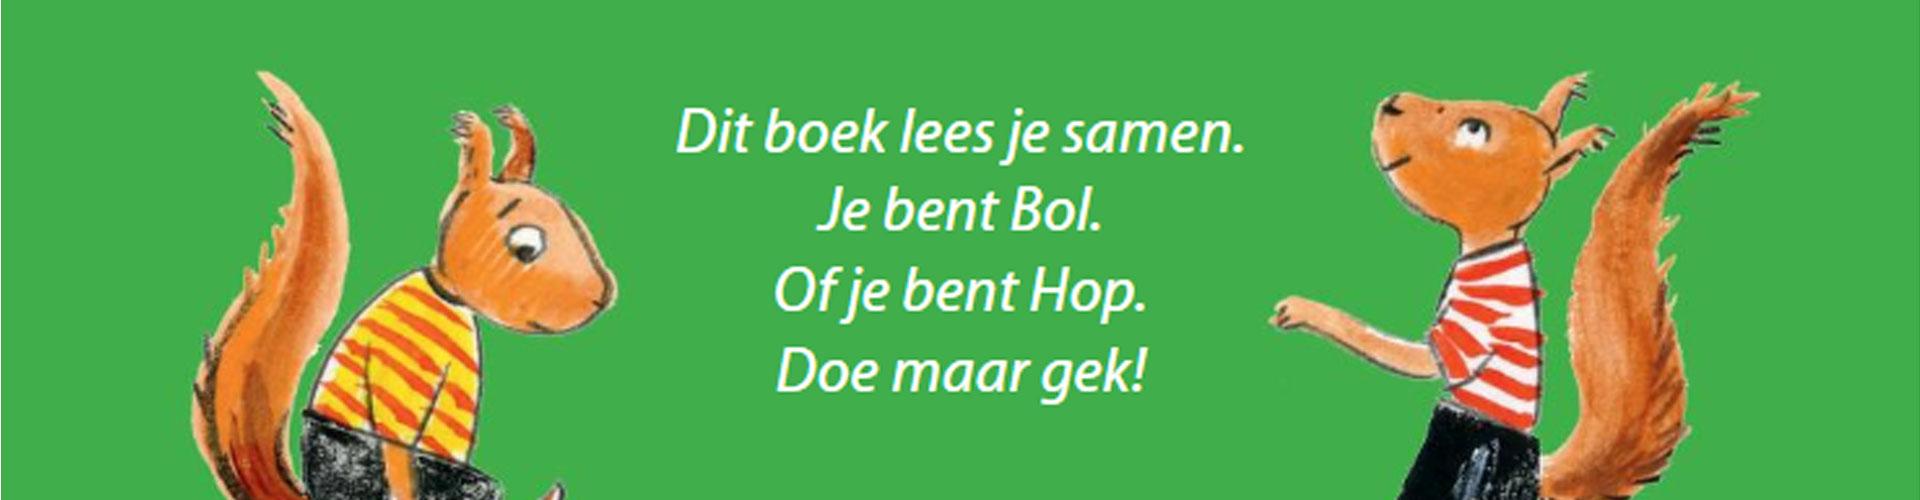 Bange-bol-en-de-dappere-hop-Aag-Vernelen-Jan-de-Kinder